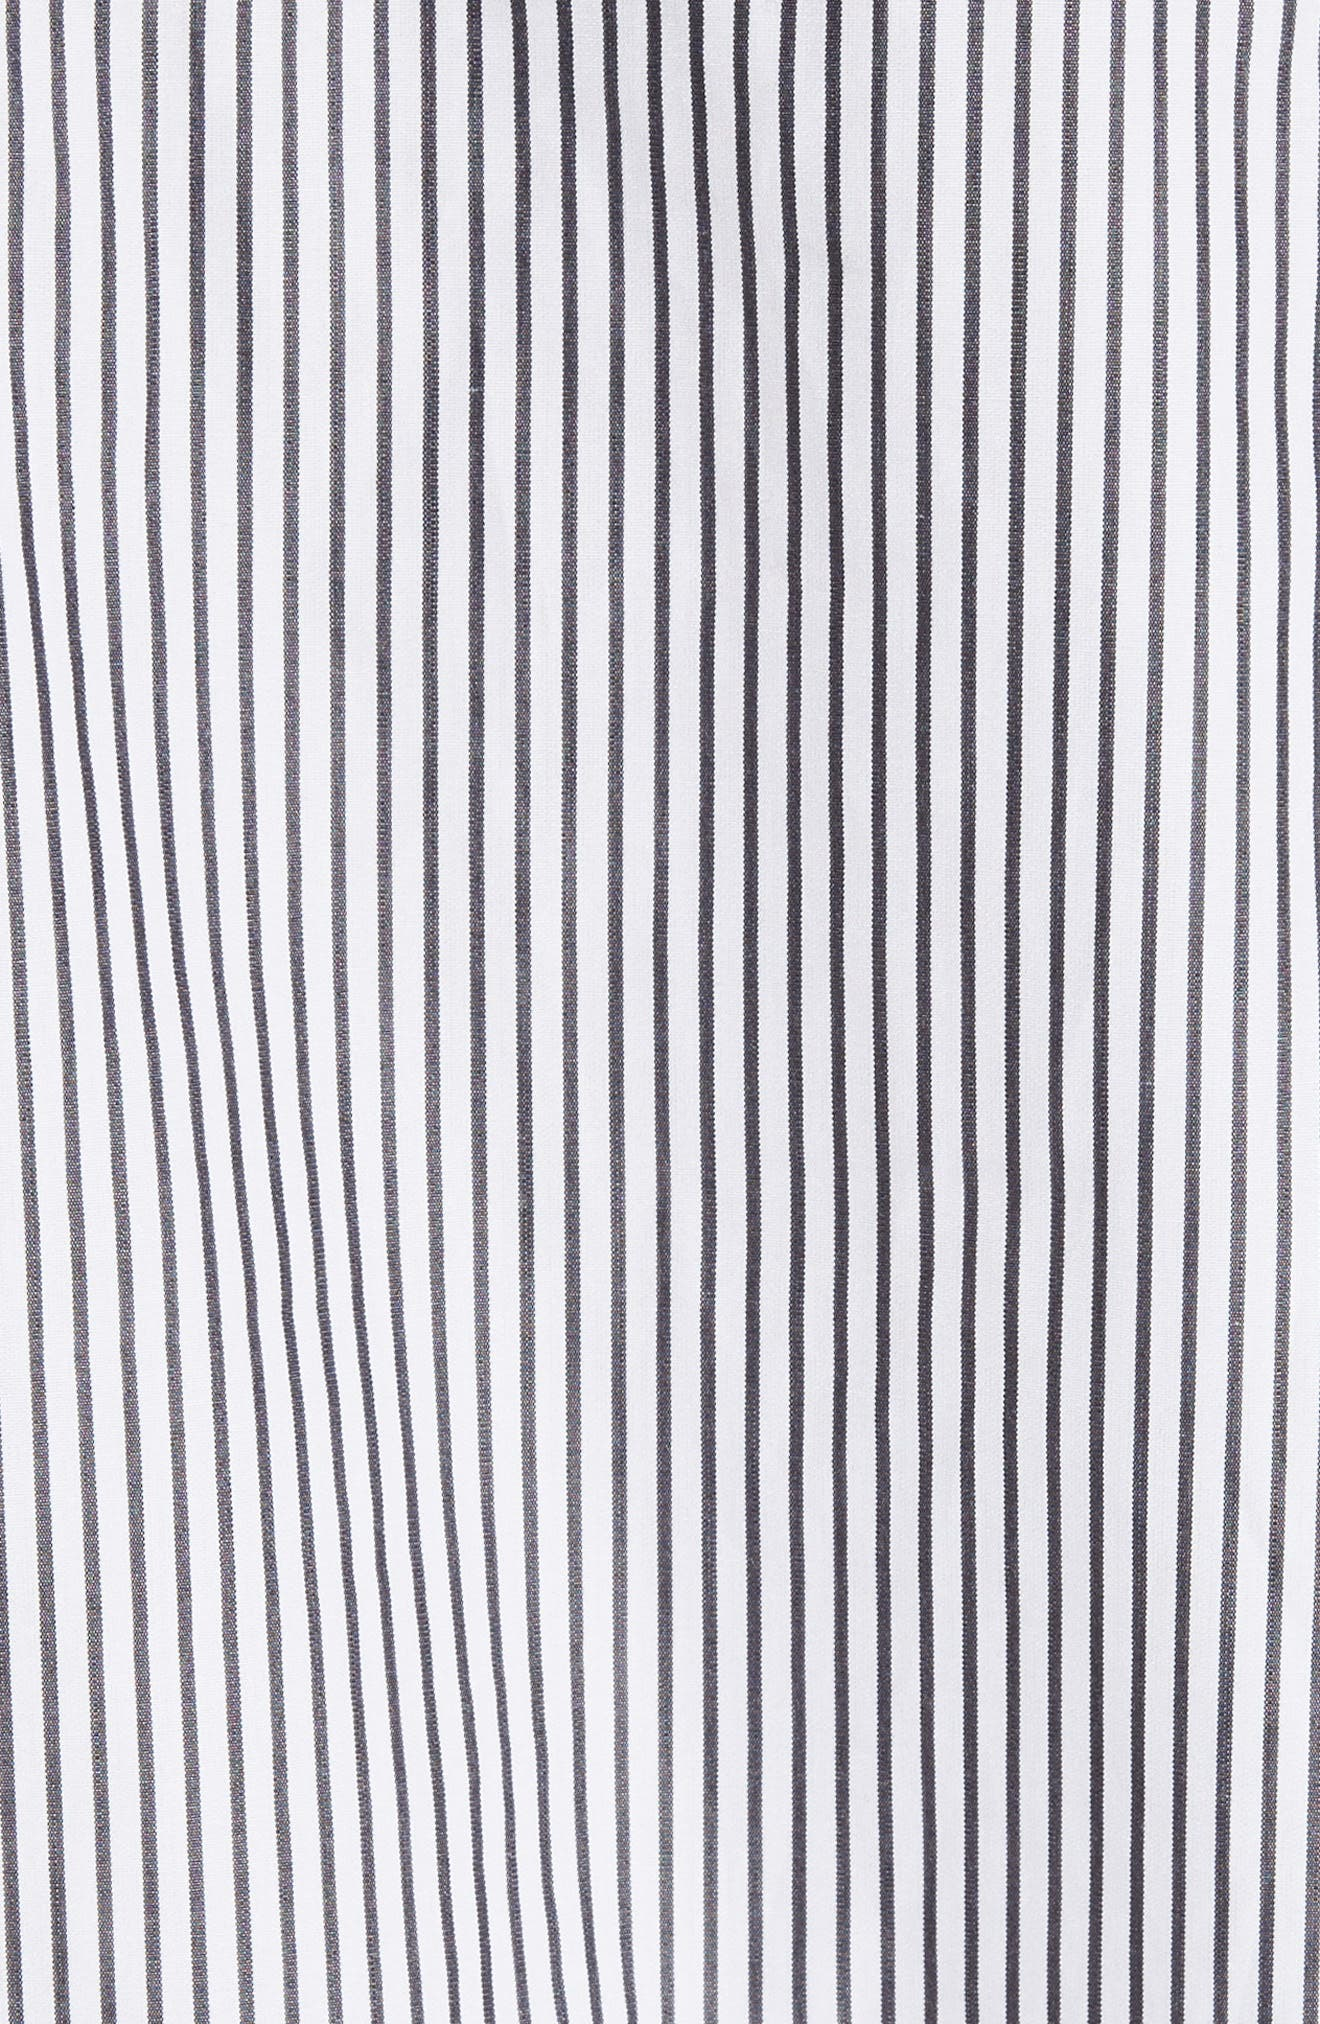 Bow Sleeve Shirt,                             Alternate thumbnail 5, color,                             Black/ White